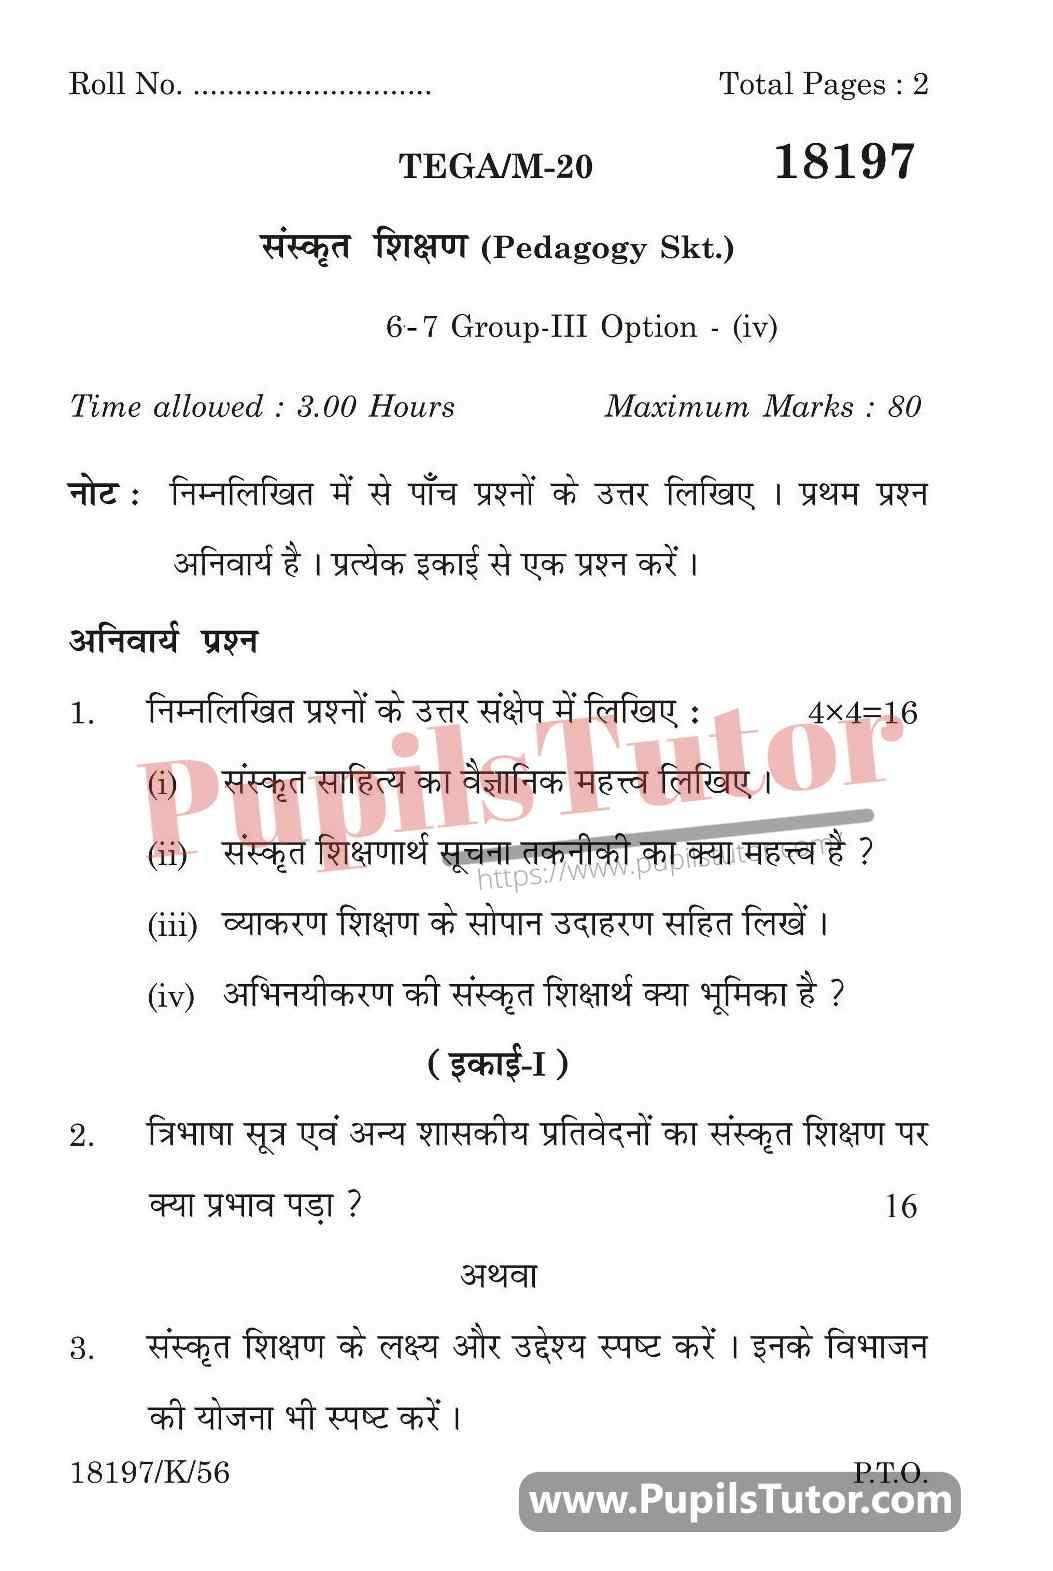 KUK (Kurukshetra University, Haryana) Pedagogy Of Sanskrit Shikshan Question Paper 2020 For B.Ed 1st And 2nd Year And All The 4 Semesters Free Download PDF - Page 1 - Pupils Tutor